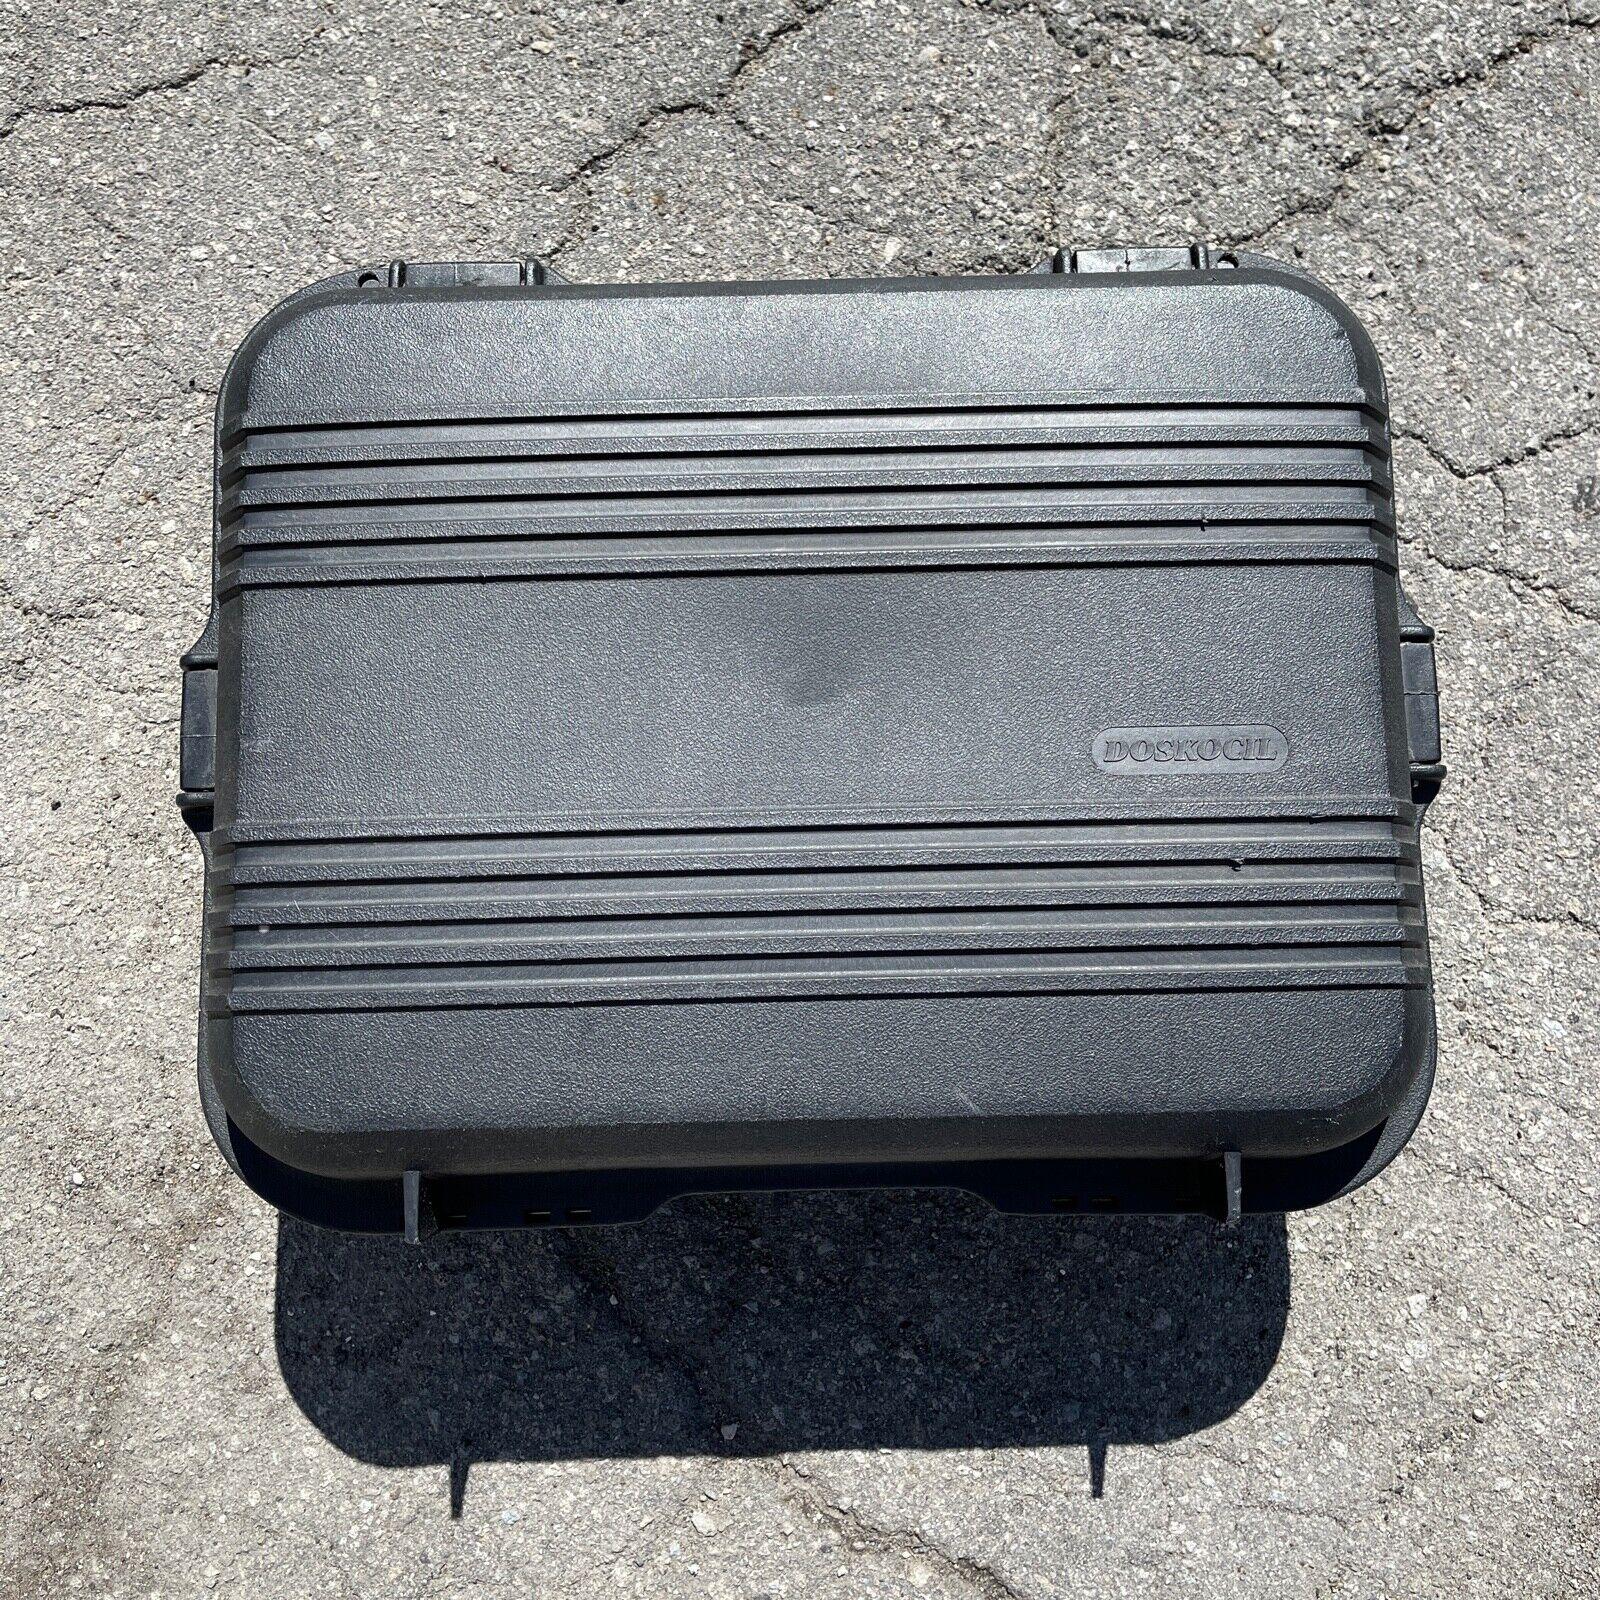 ^ Doskocil Weatherproof Waterproof Locking Case w/ Camera Inserts [pre cut]